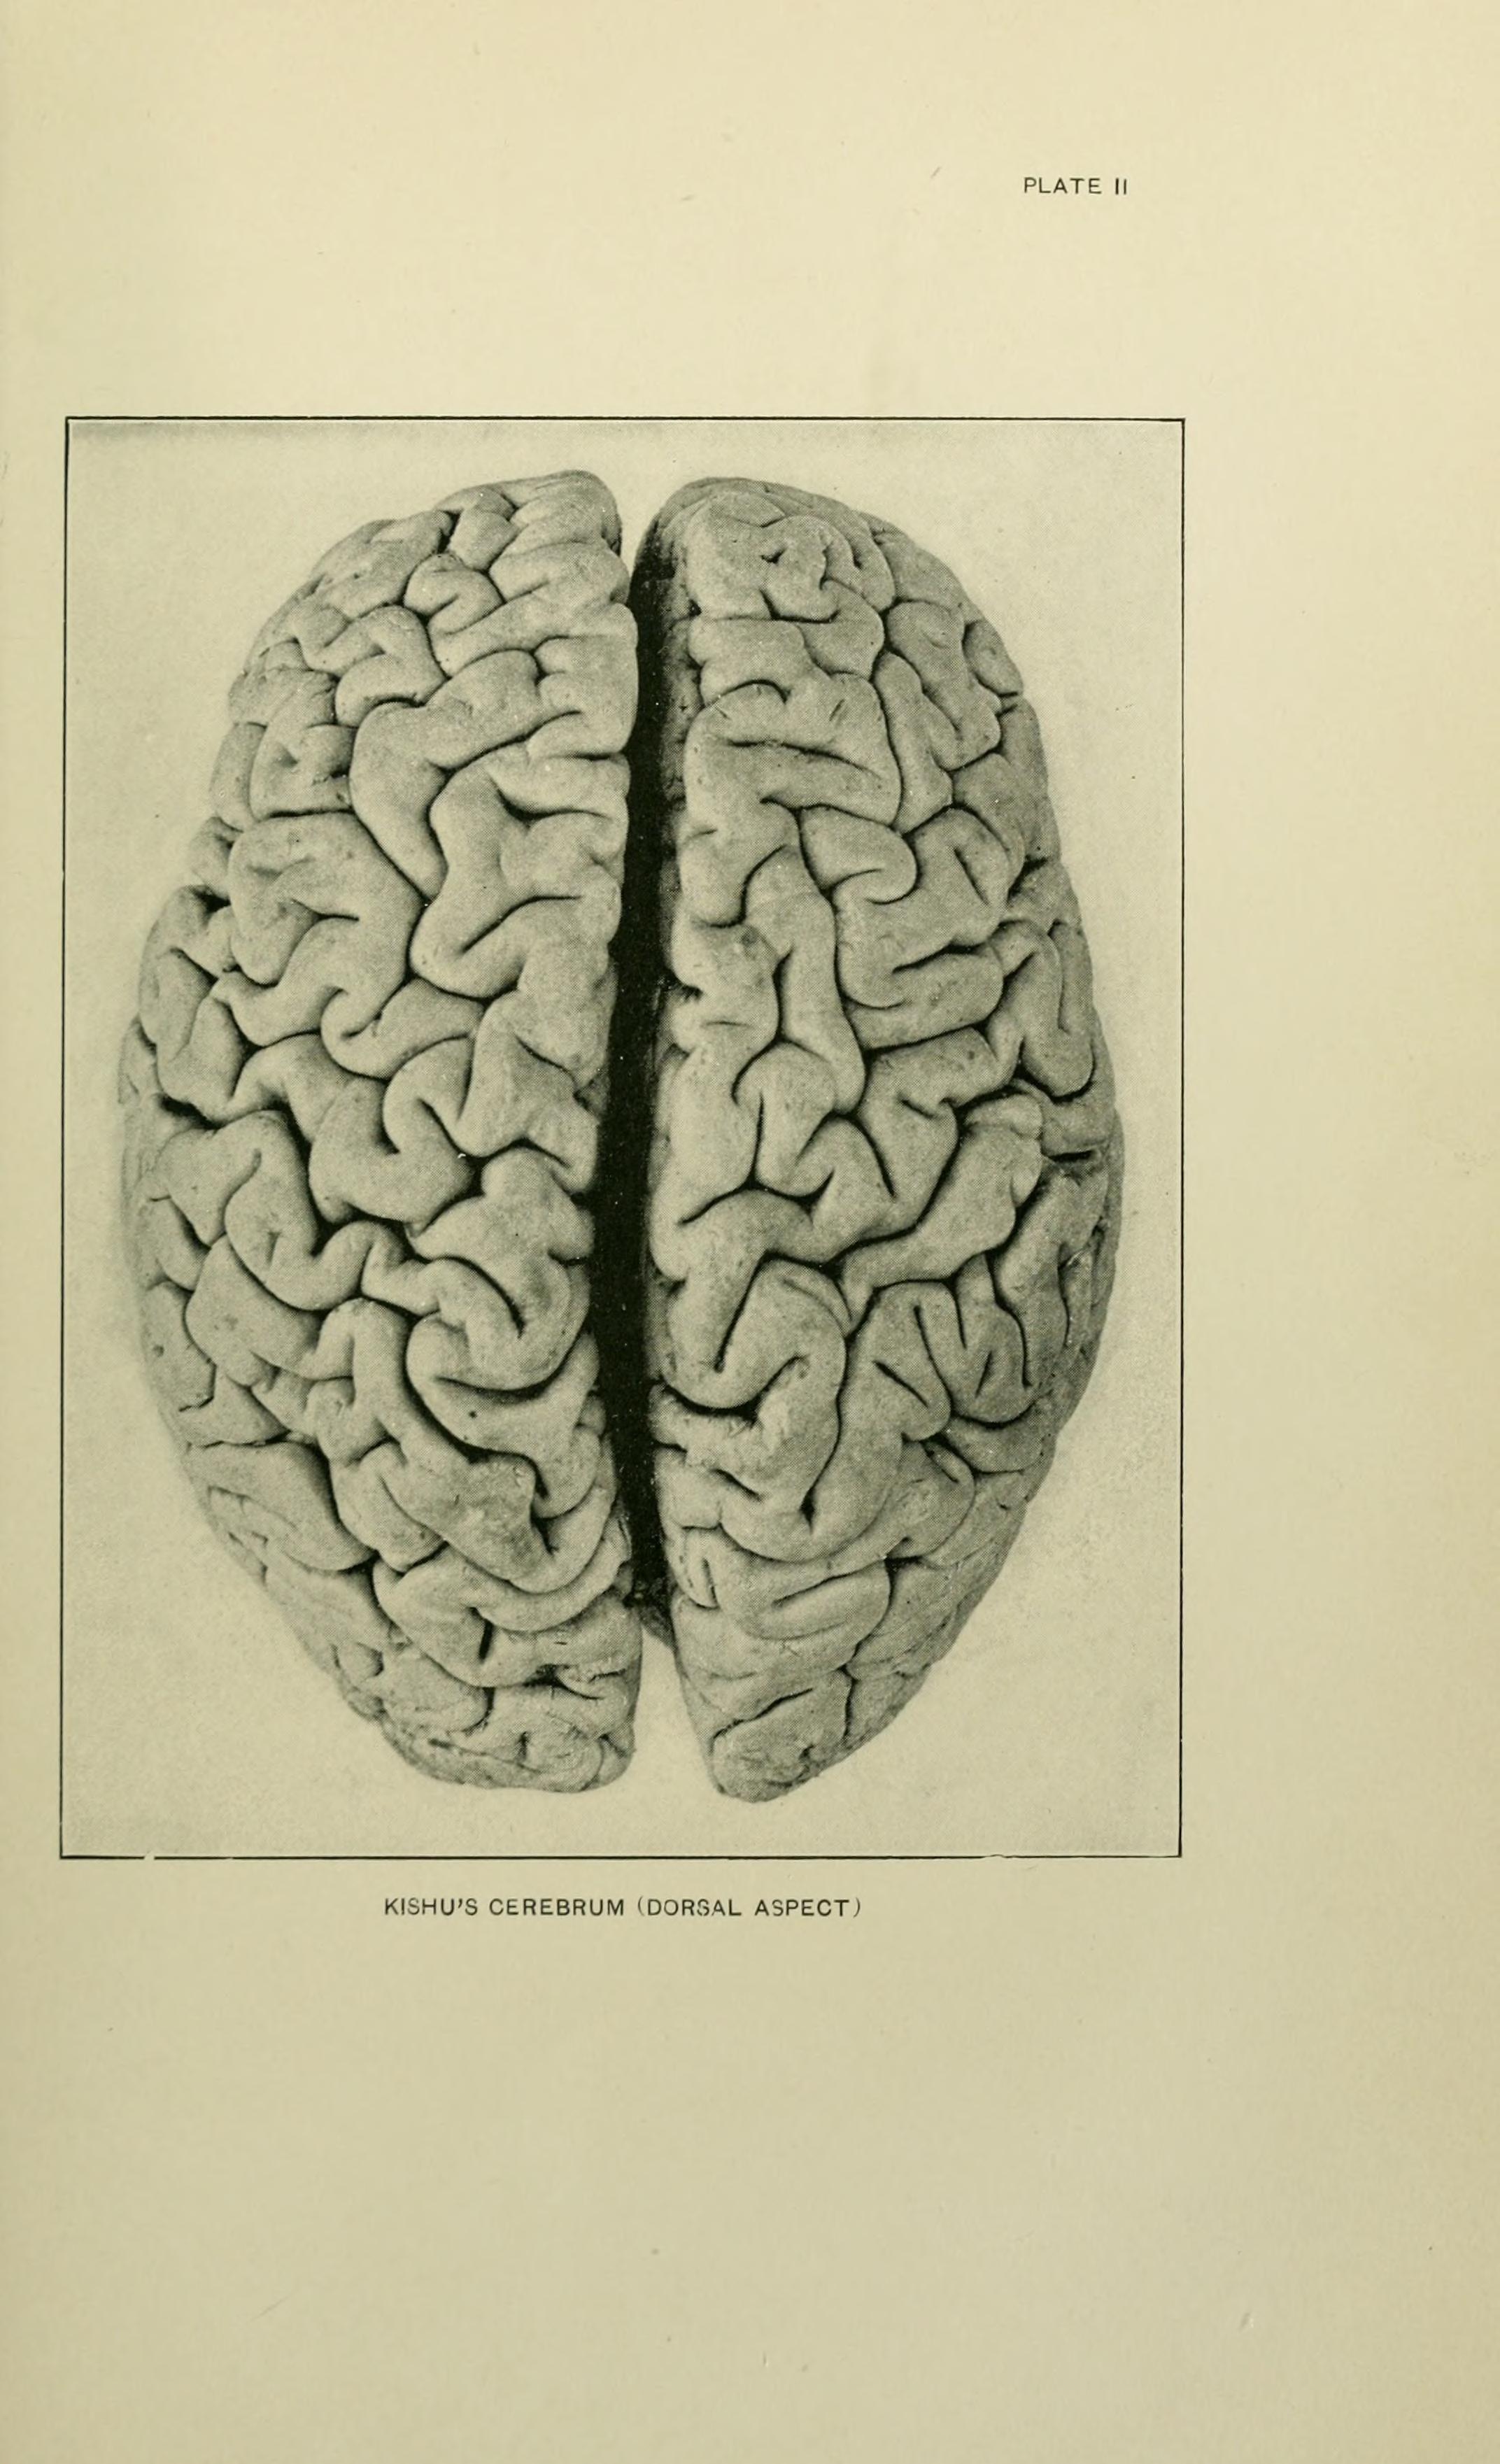 vintage anatomy - Kishu\'s cerebrum (Eskimo brain), dorsal aspect ...